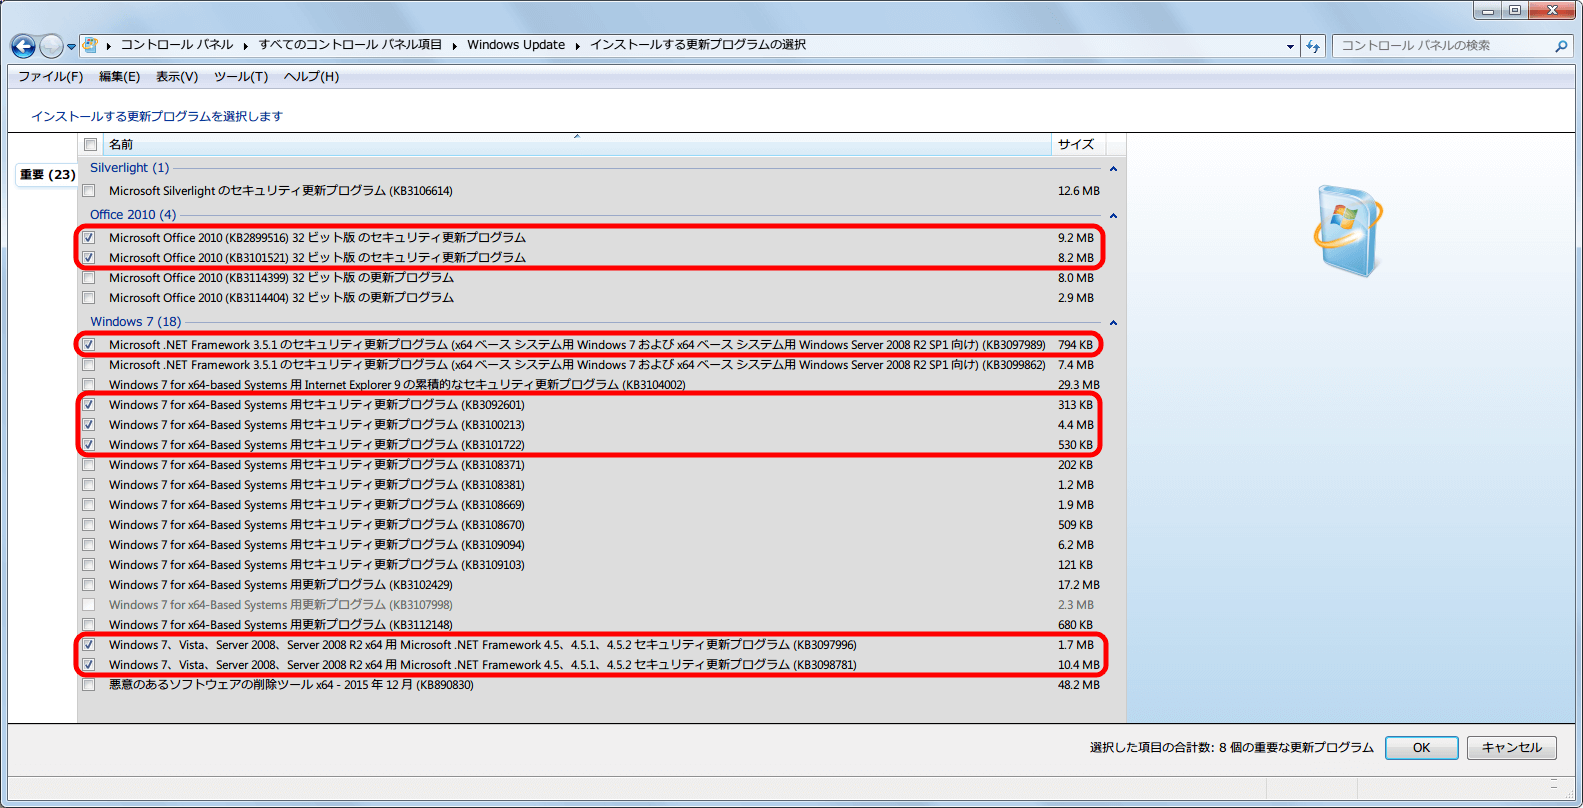 Windows Update 2015年11月分インストール後、再起動